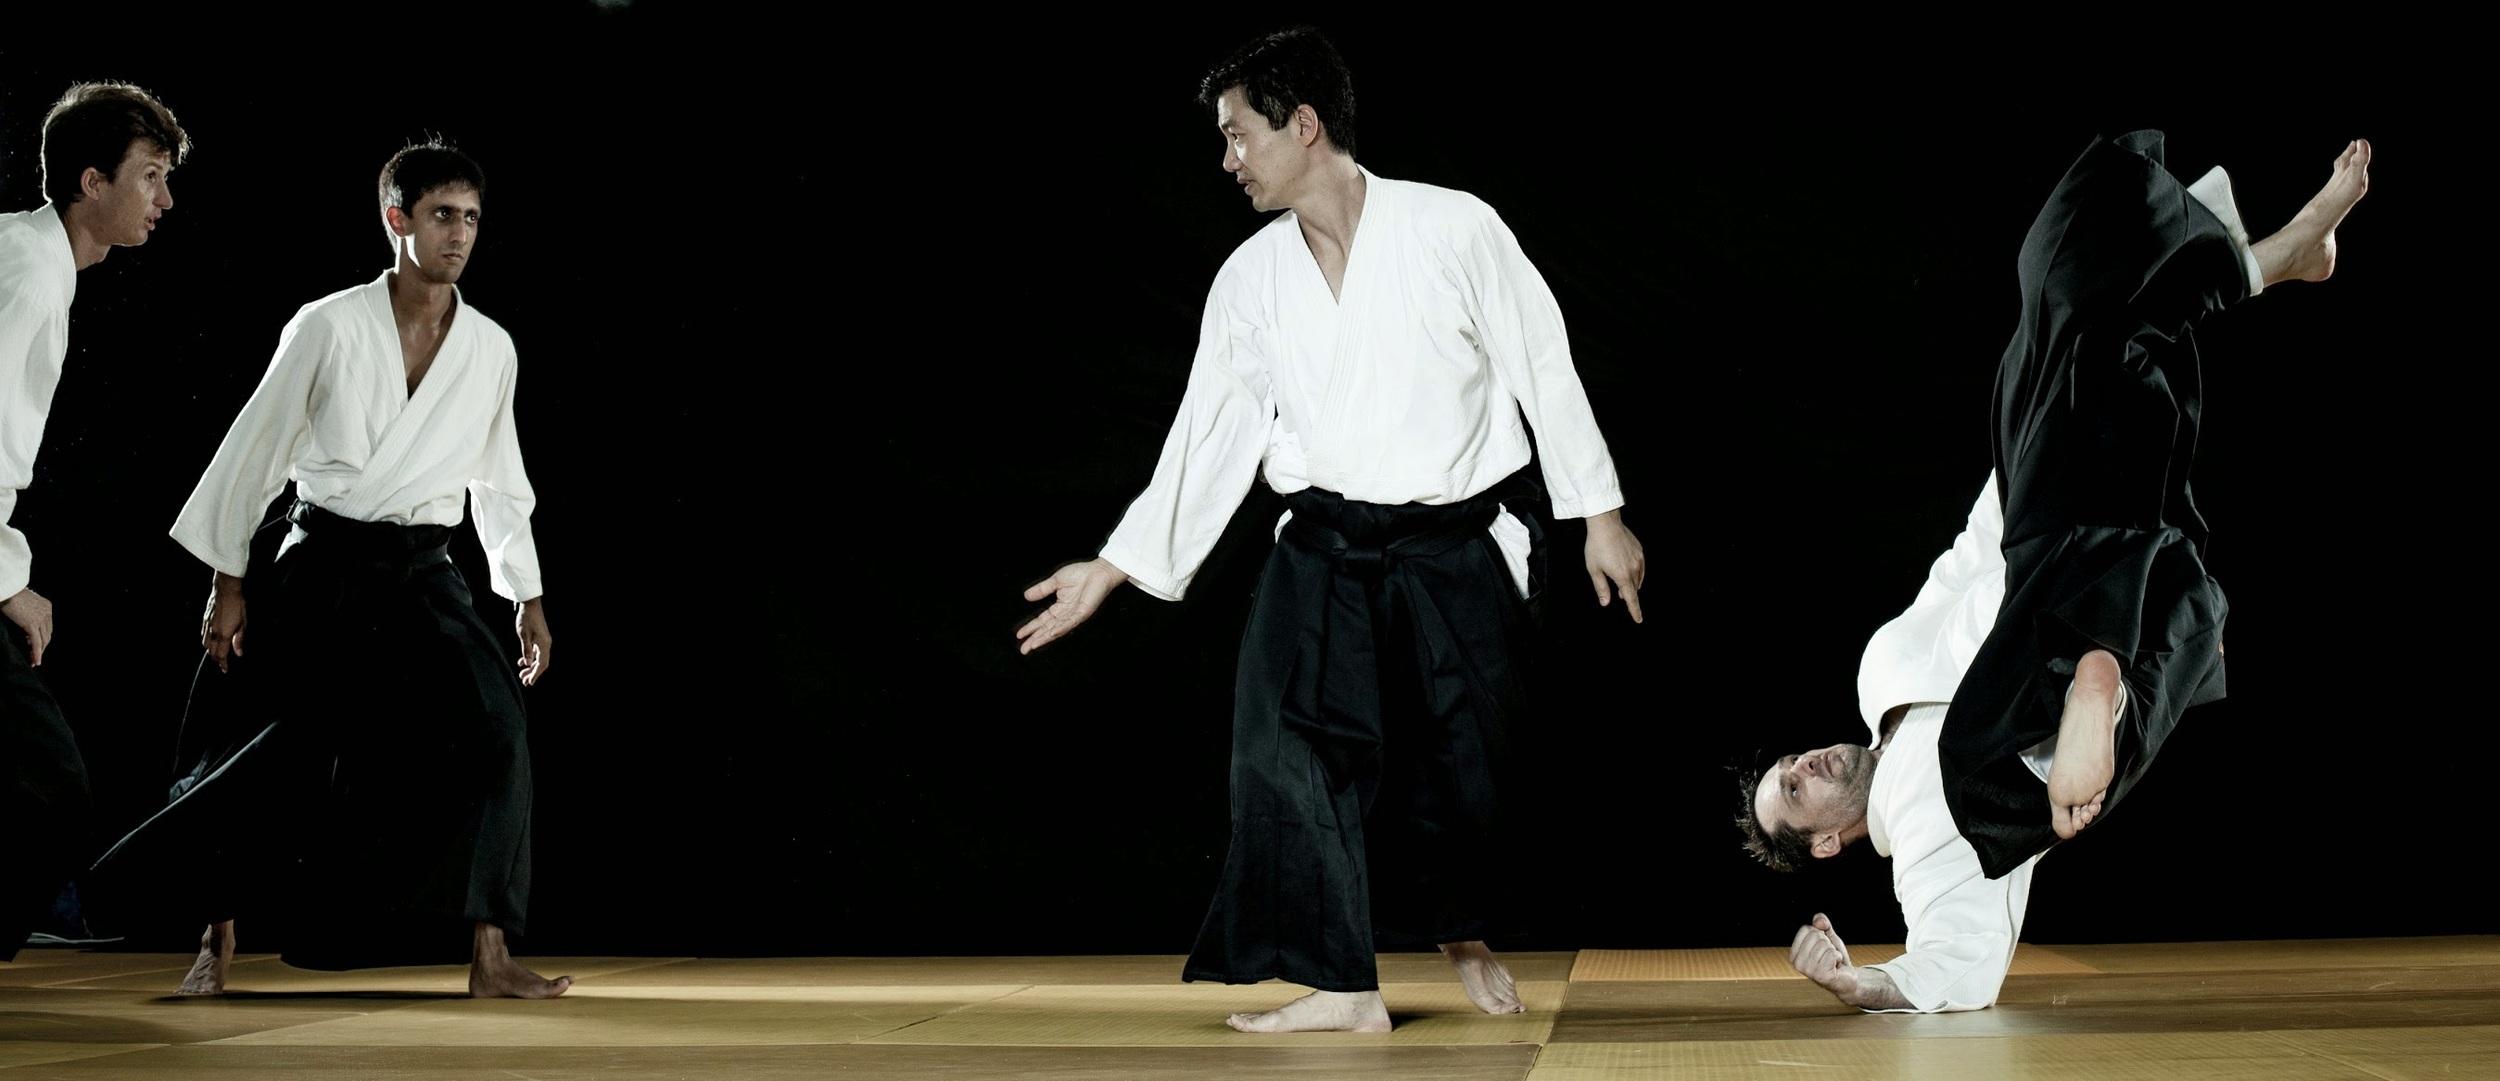 Aikido_Mar_2014-3153.jpg